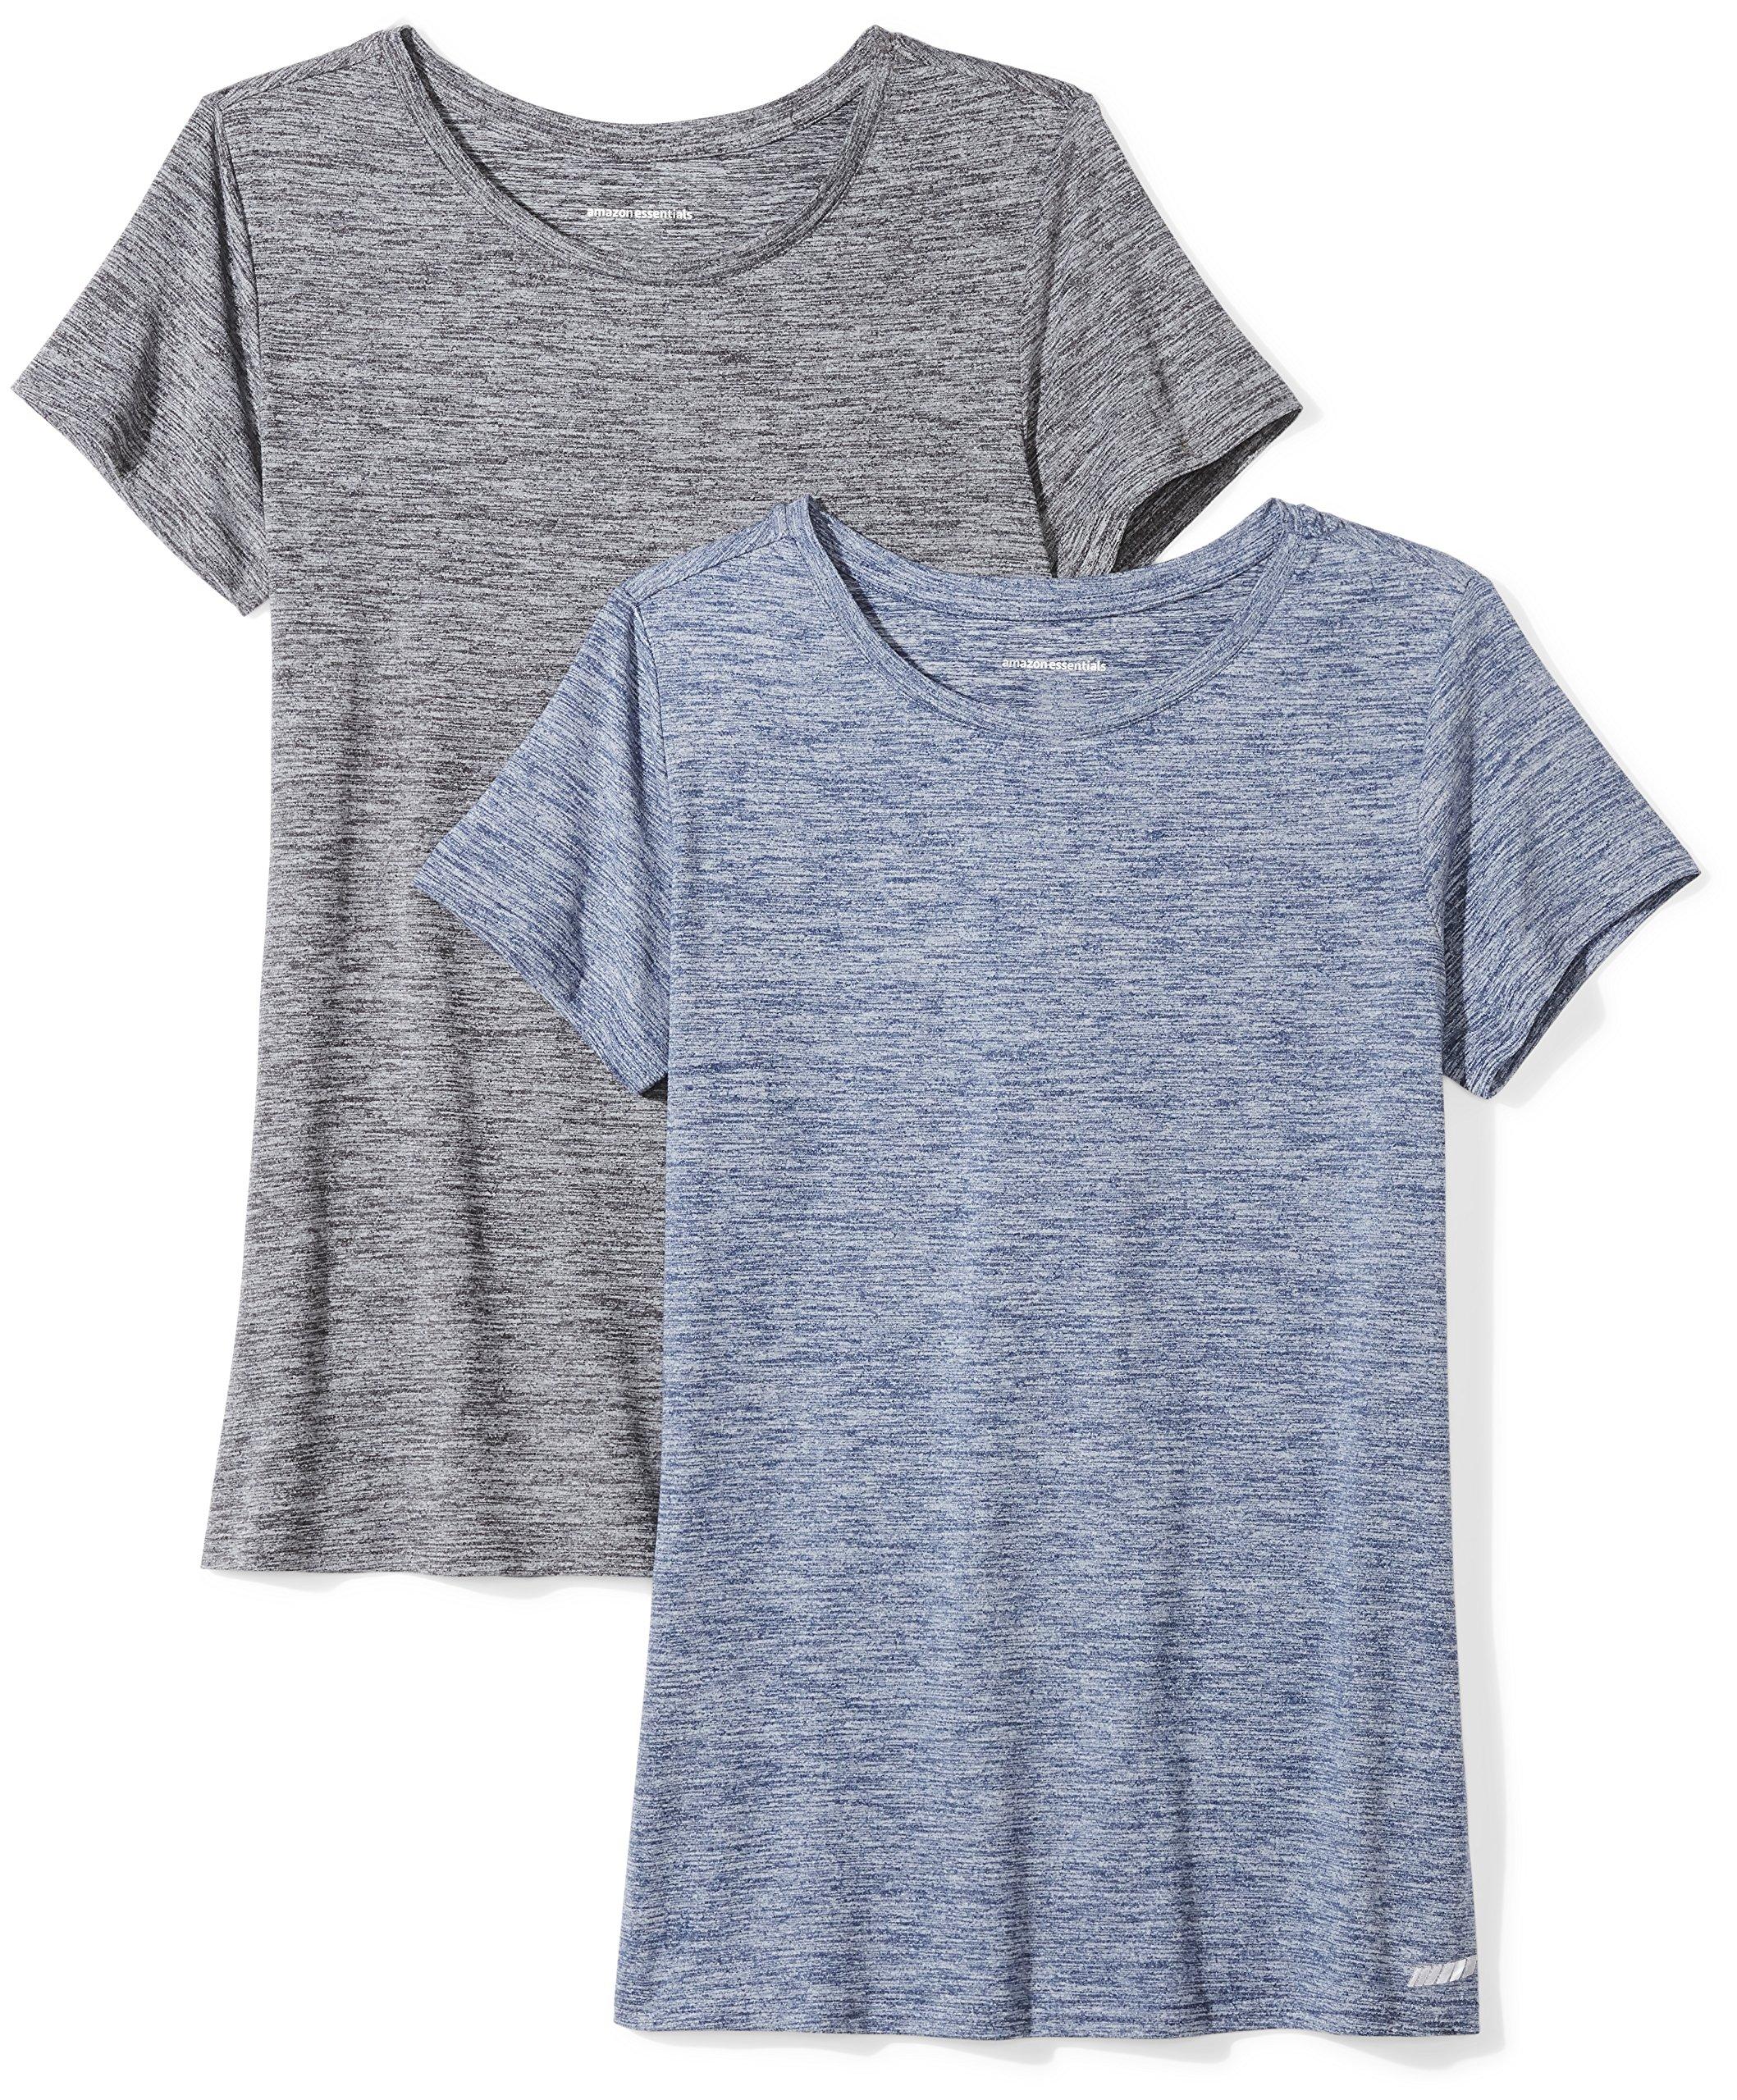 Amazon Essentials Women's 2-Pack Tech Stretch Short-Sleeve Crewneck T-Shirt, -black heather/navy heather, XX-Large by Amazon Essentials